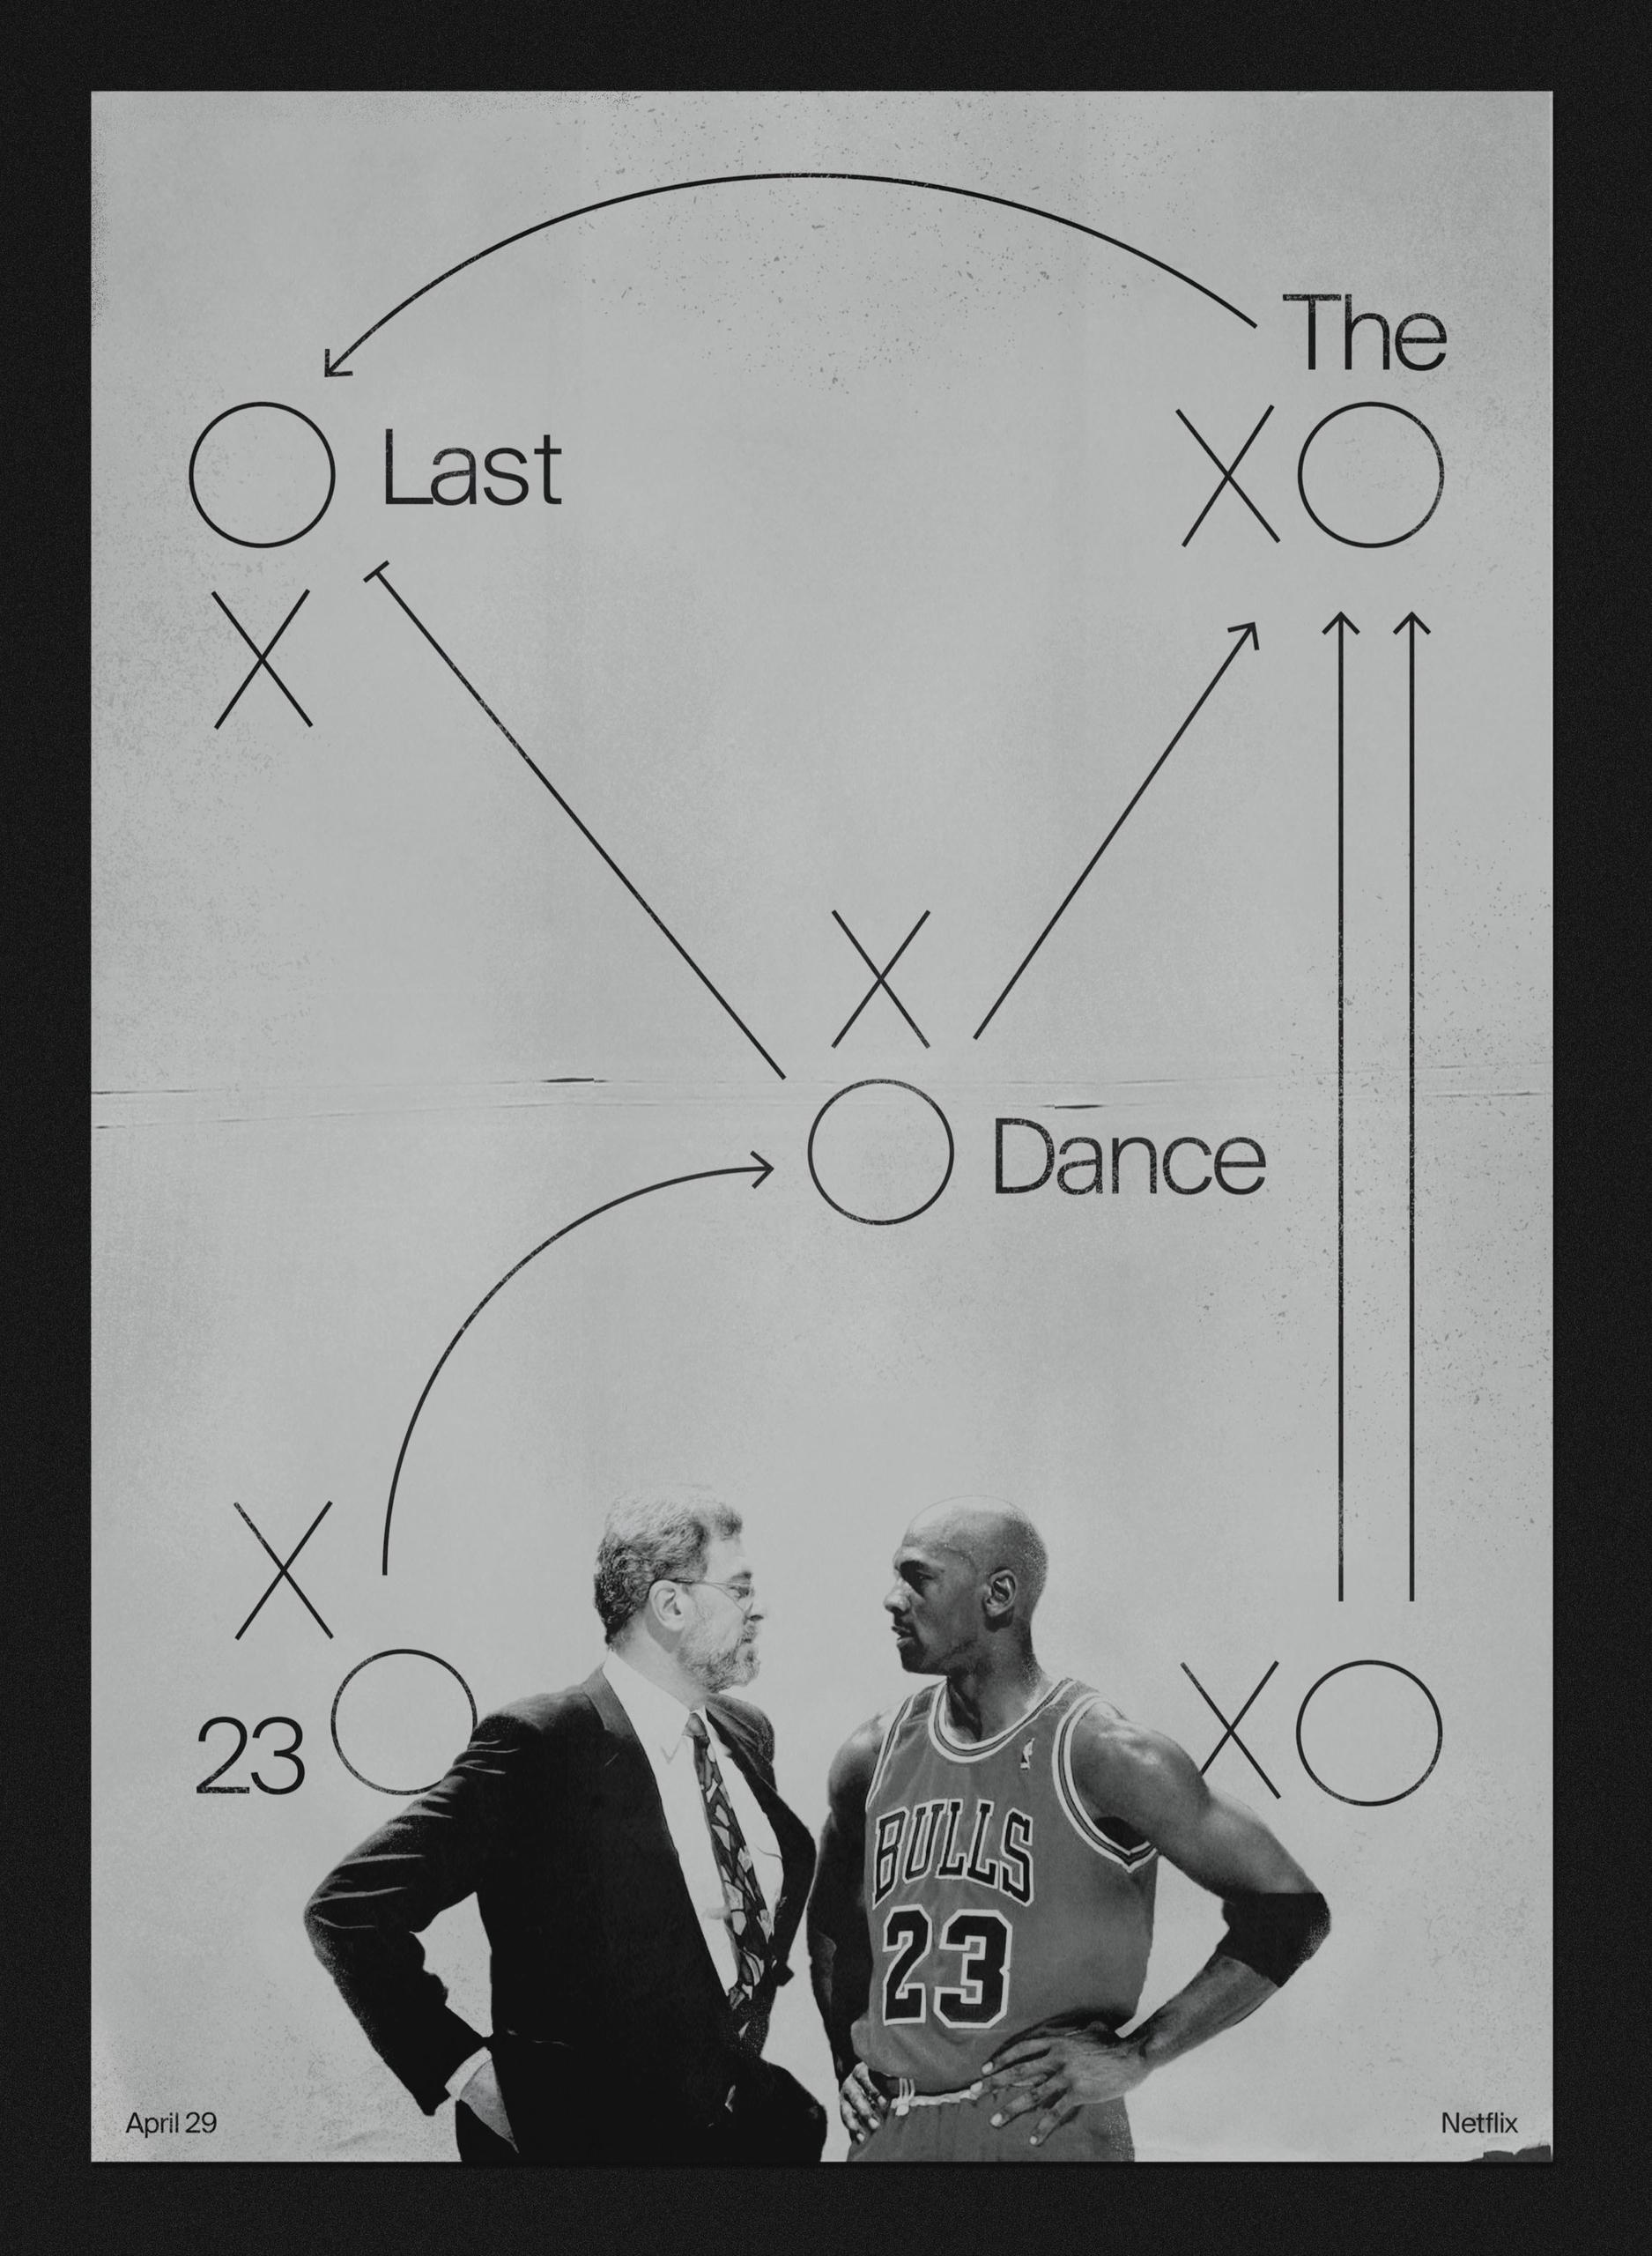 Dance - thelastdance, michaeljordan - luiscoderque   ello